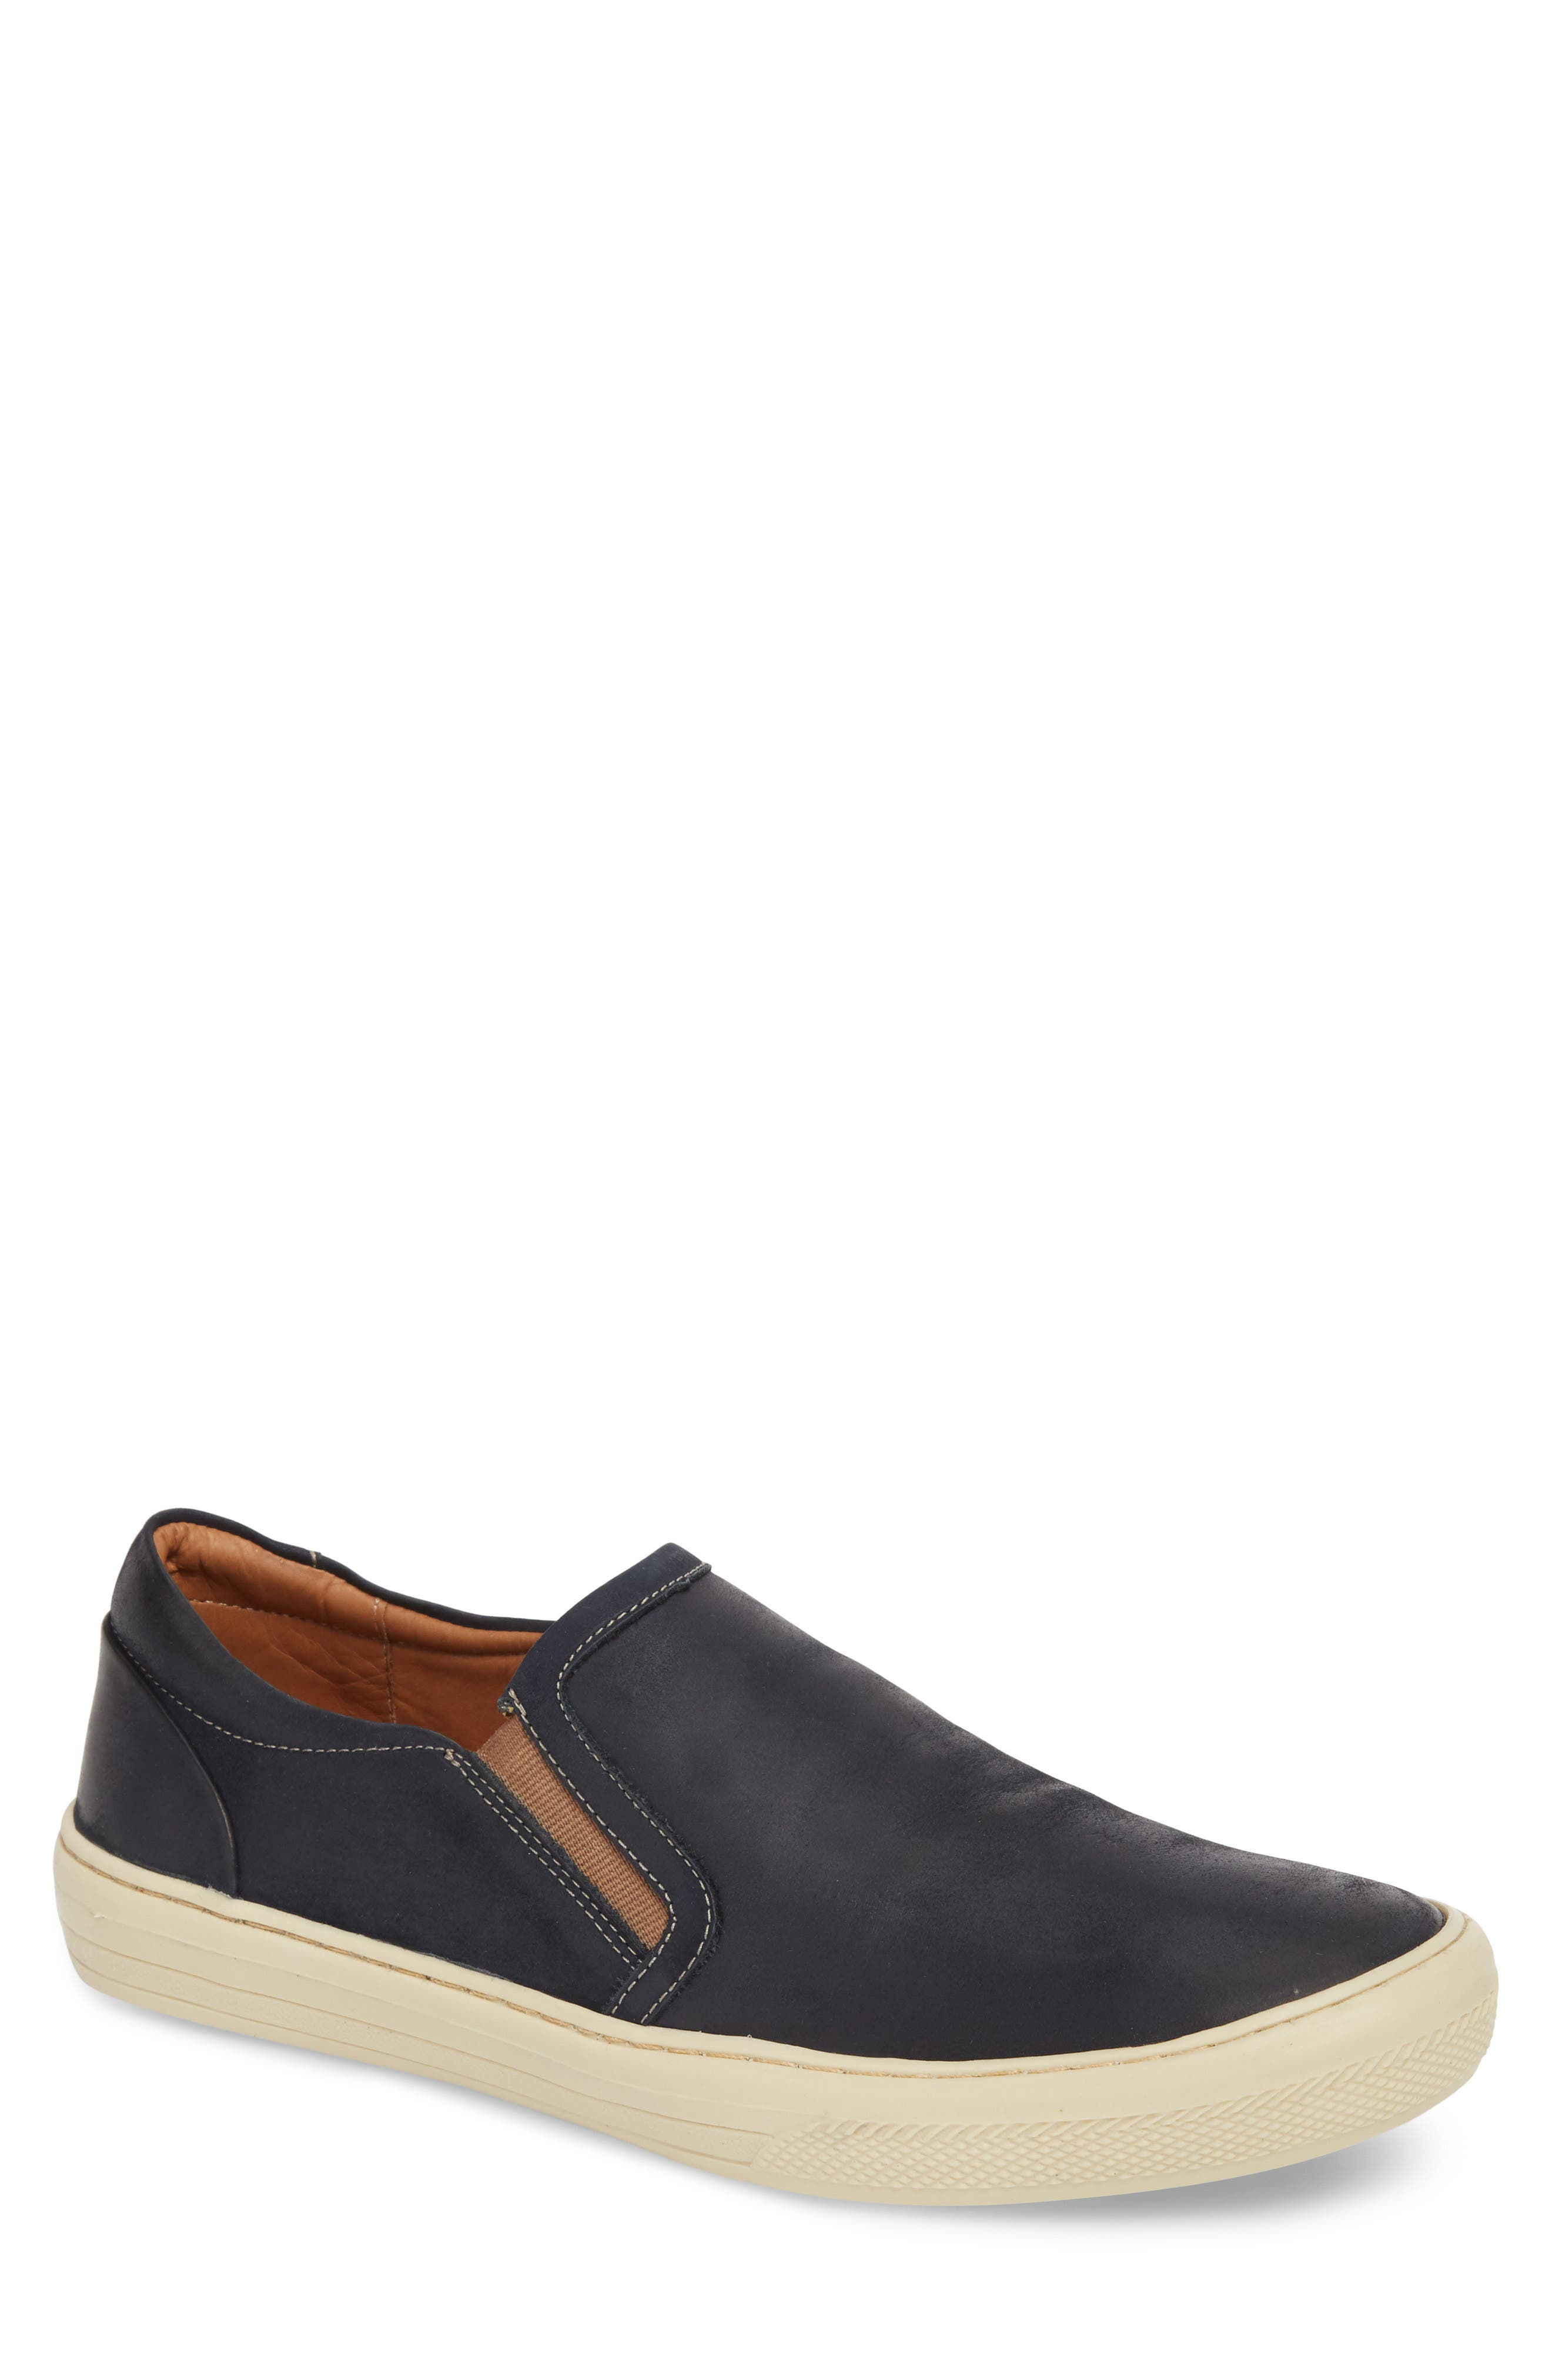 Itabuna Slip-On Sneaker,                             Main thumbnail 1, color,                             400